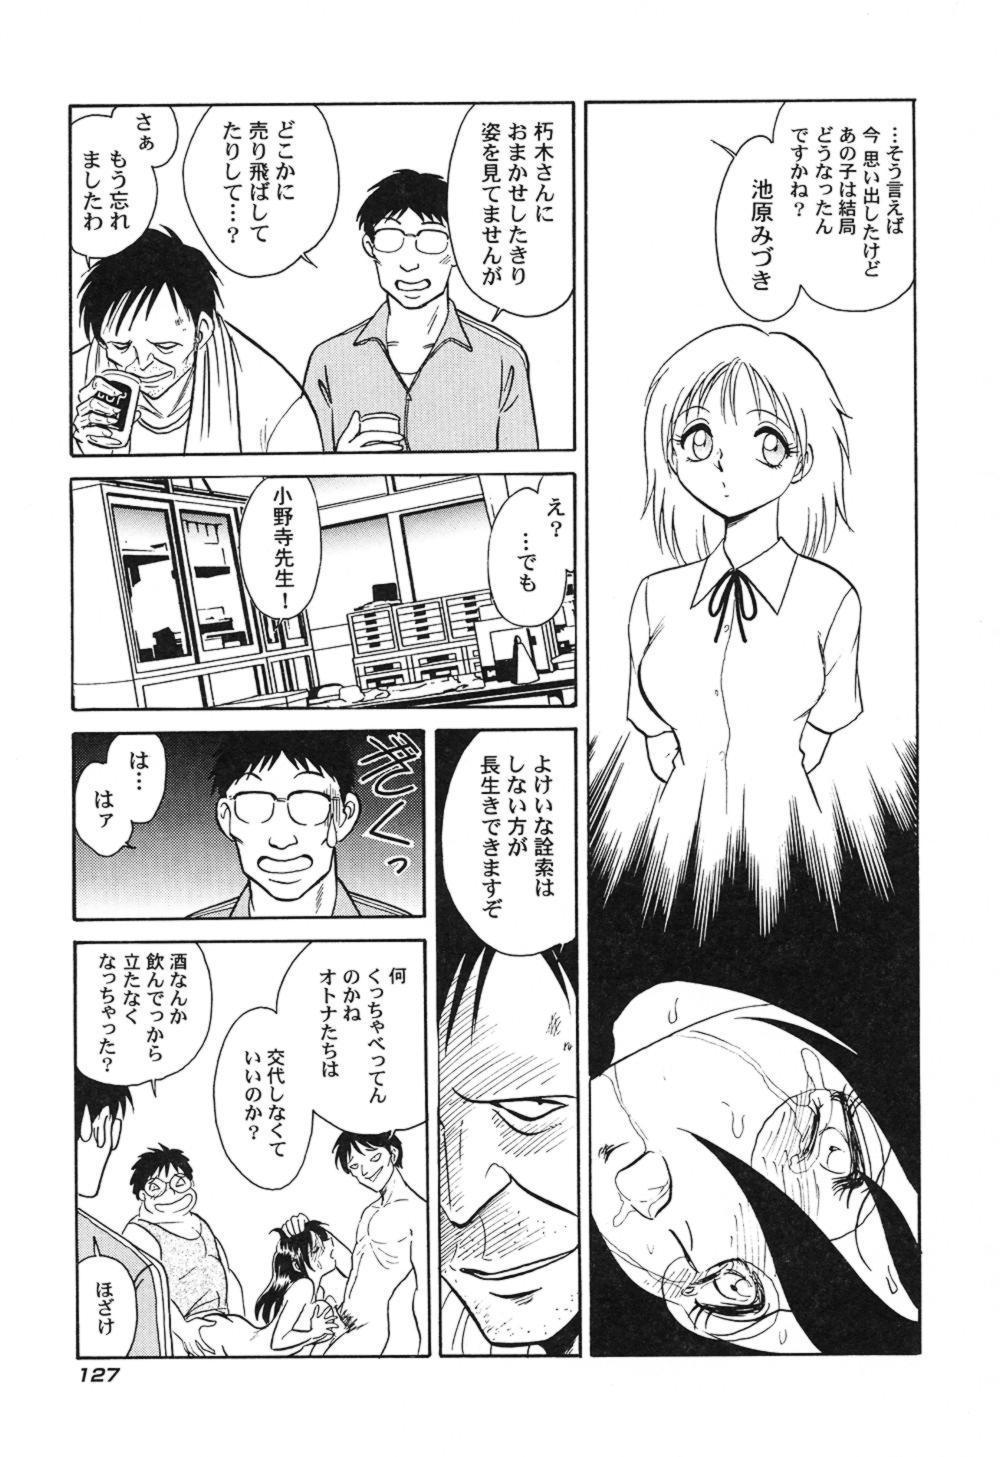 Hageshii Kagai Jugyou 129